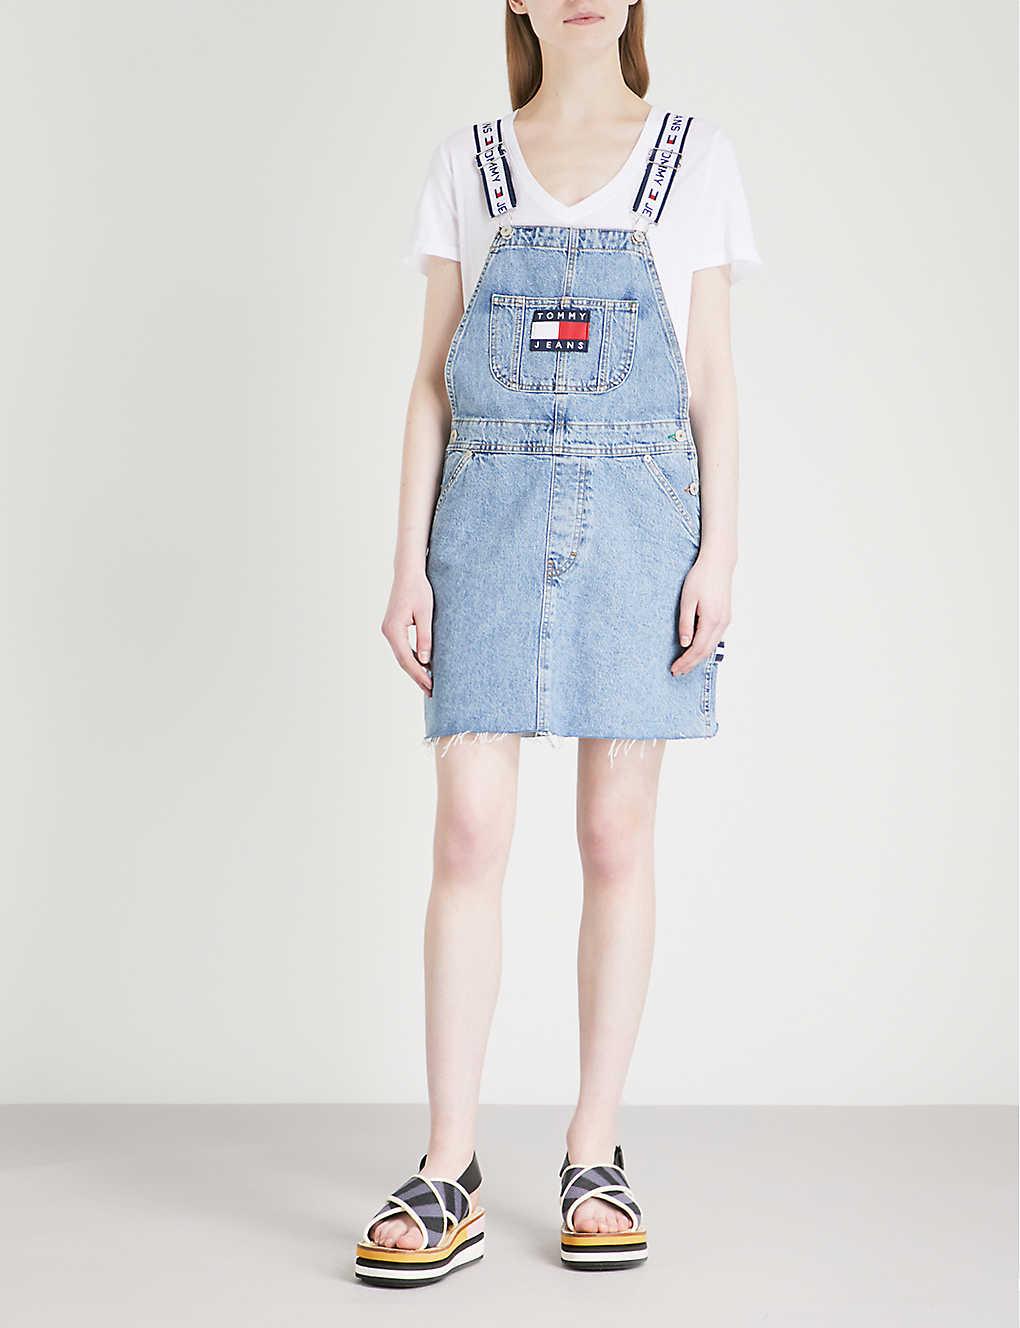 f6e0f680 Tommy Hilfiger Dress Sleeveless Denim Shirt Dress - Cotswold Hire